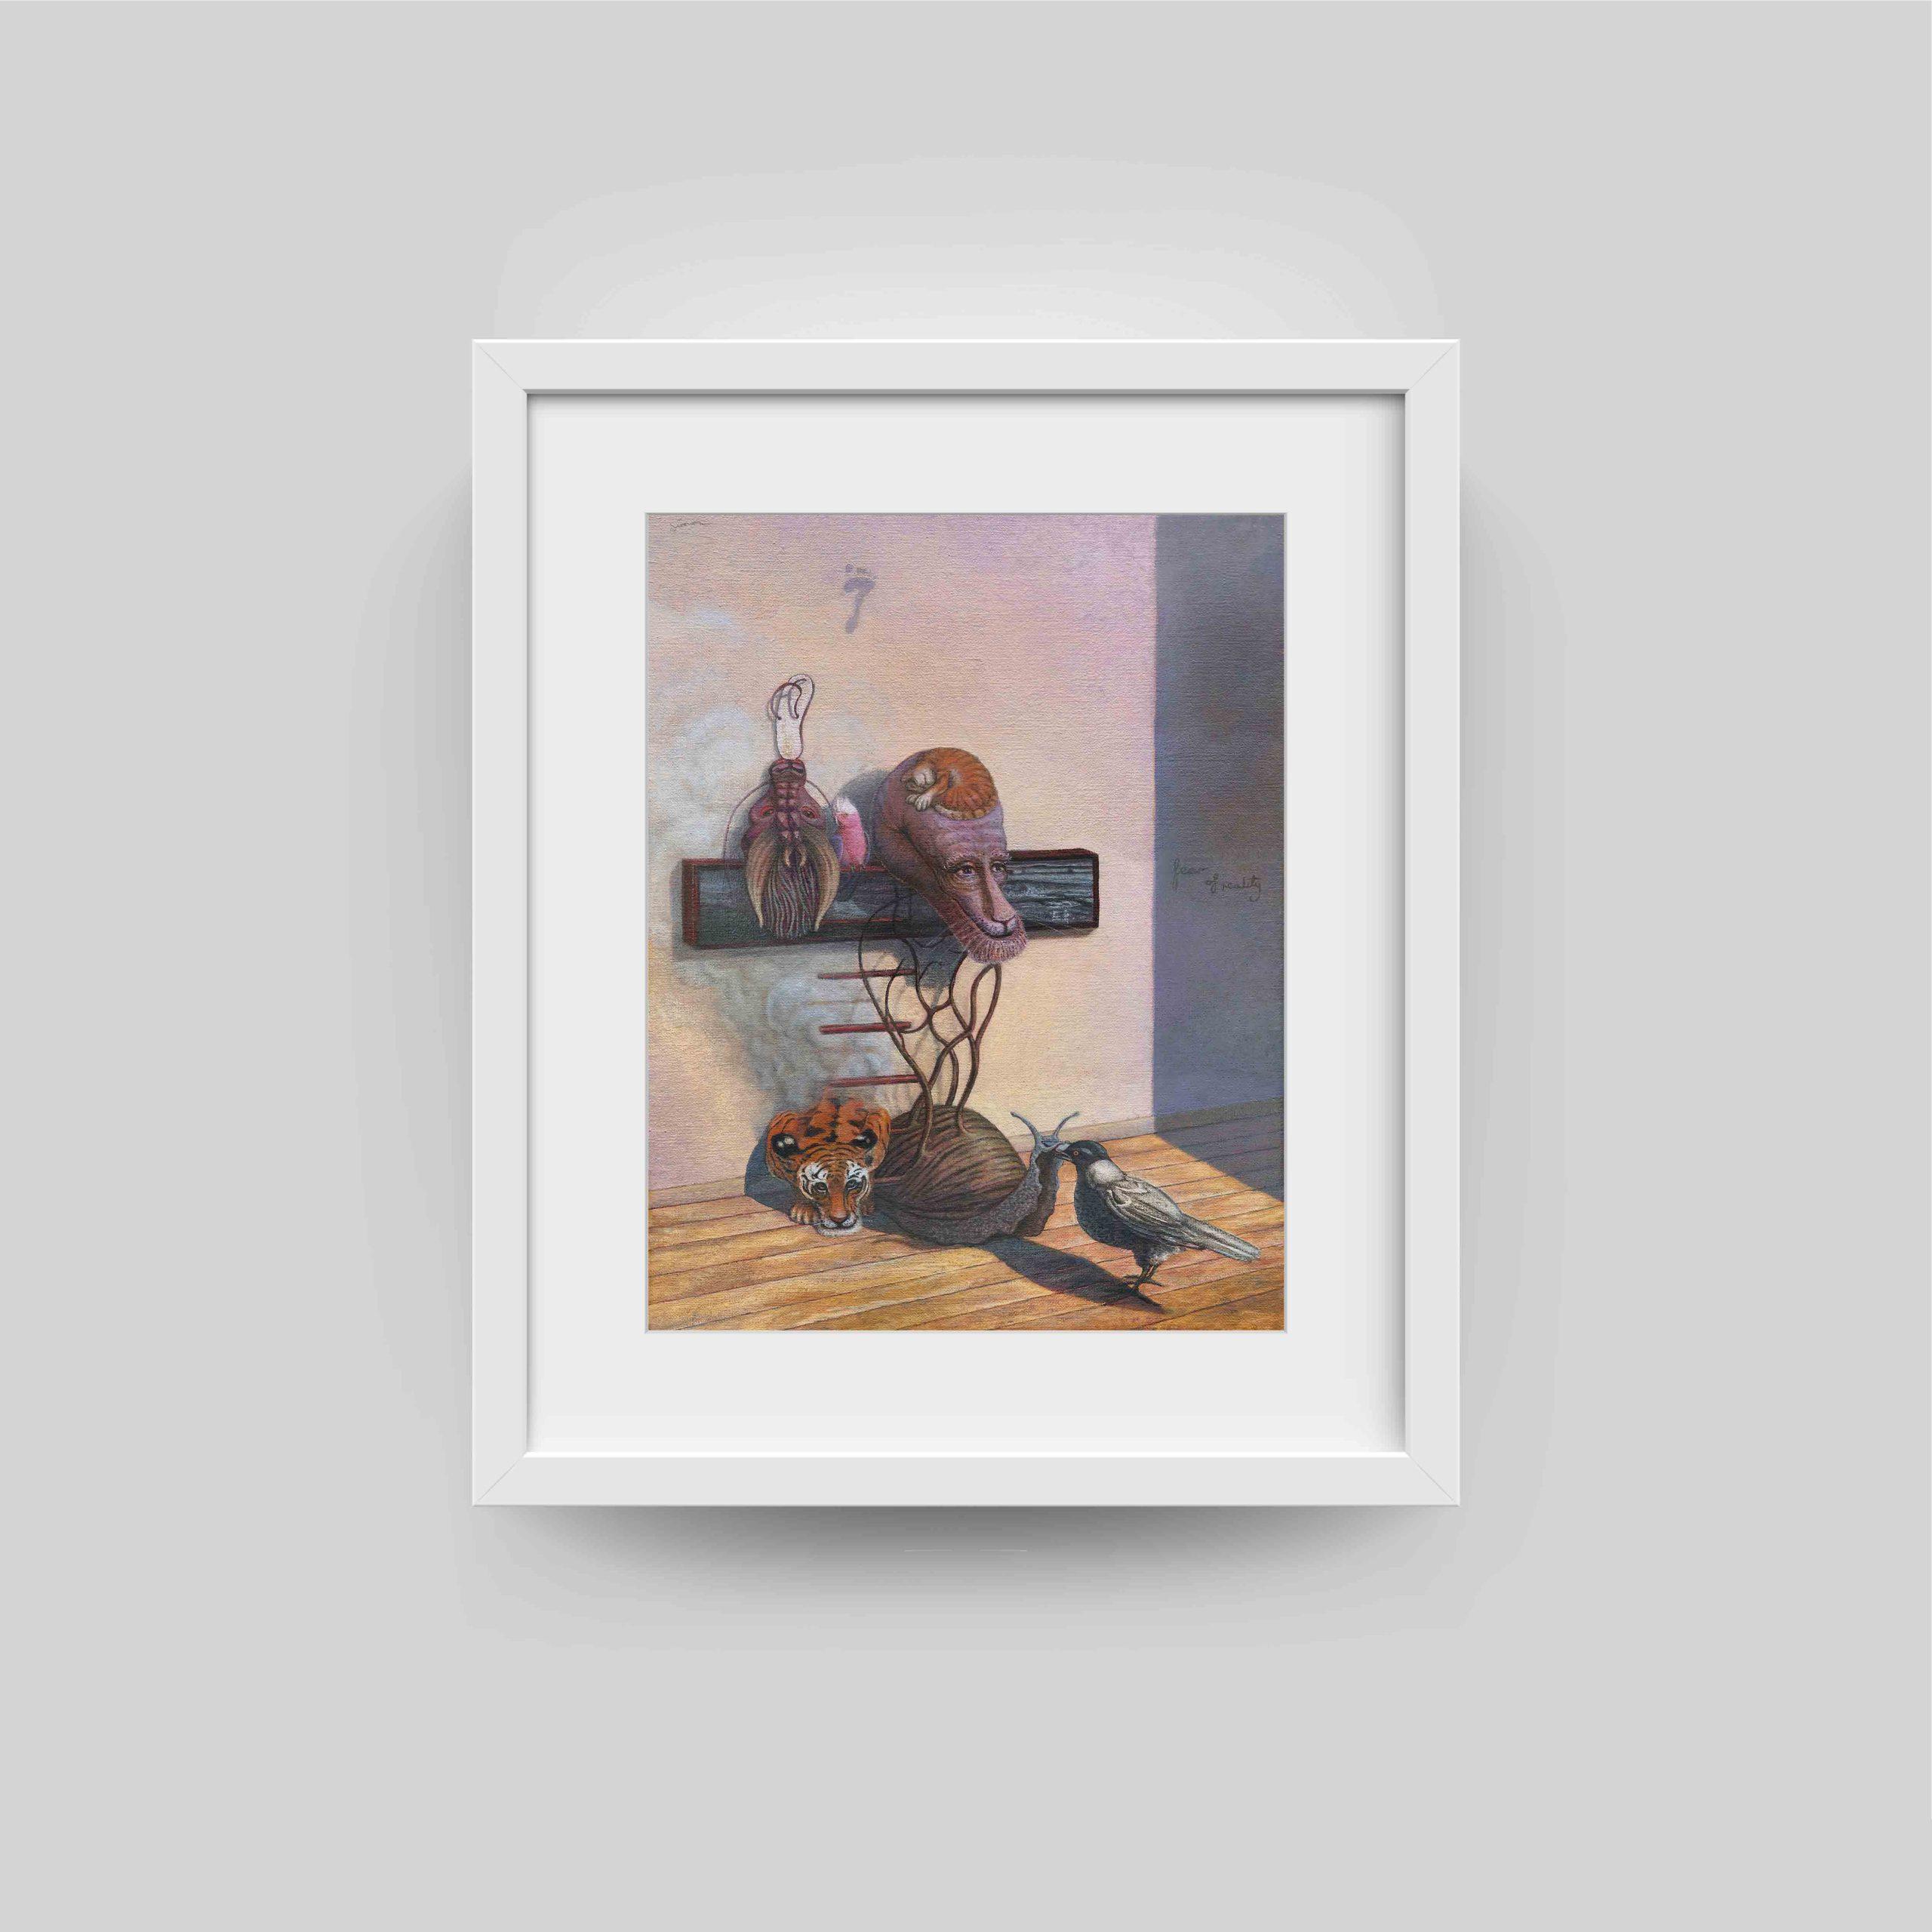 simon weir framed art